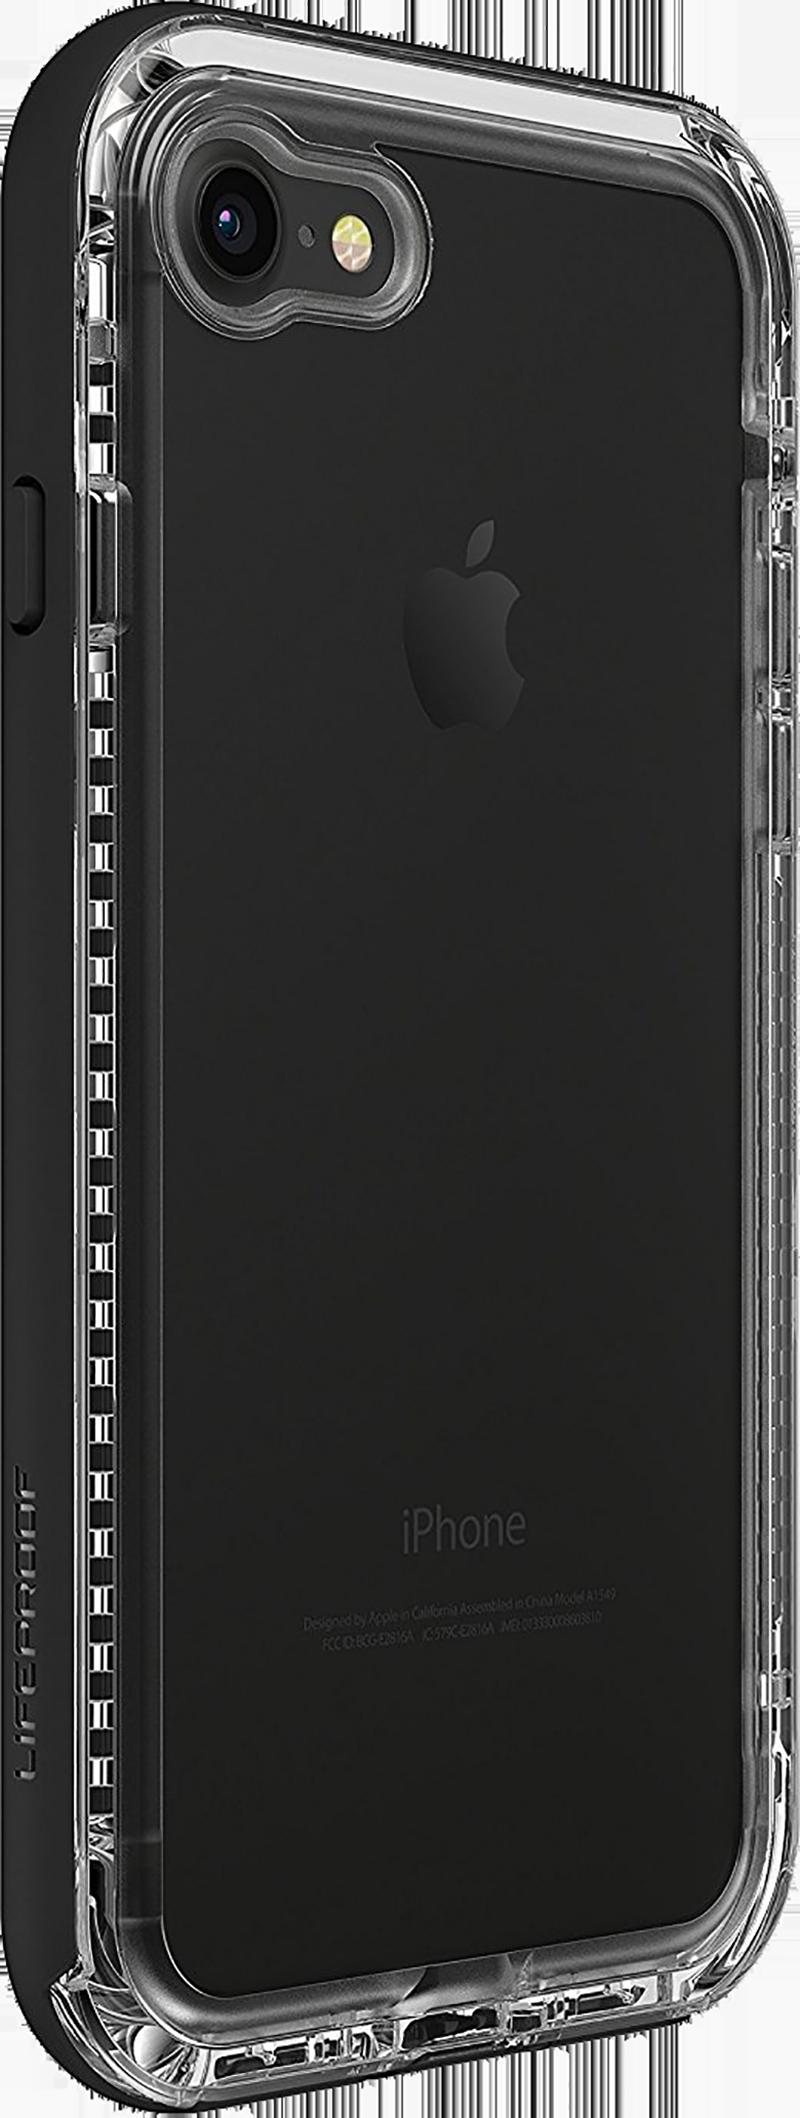 Coque Lifeproof iPhone 8 / 7 NEXT Crystal noir